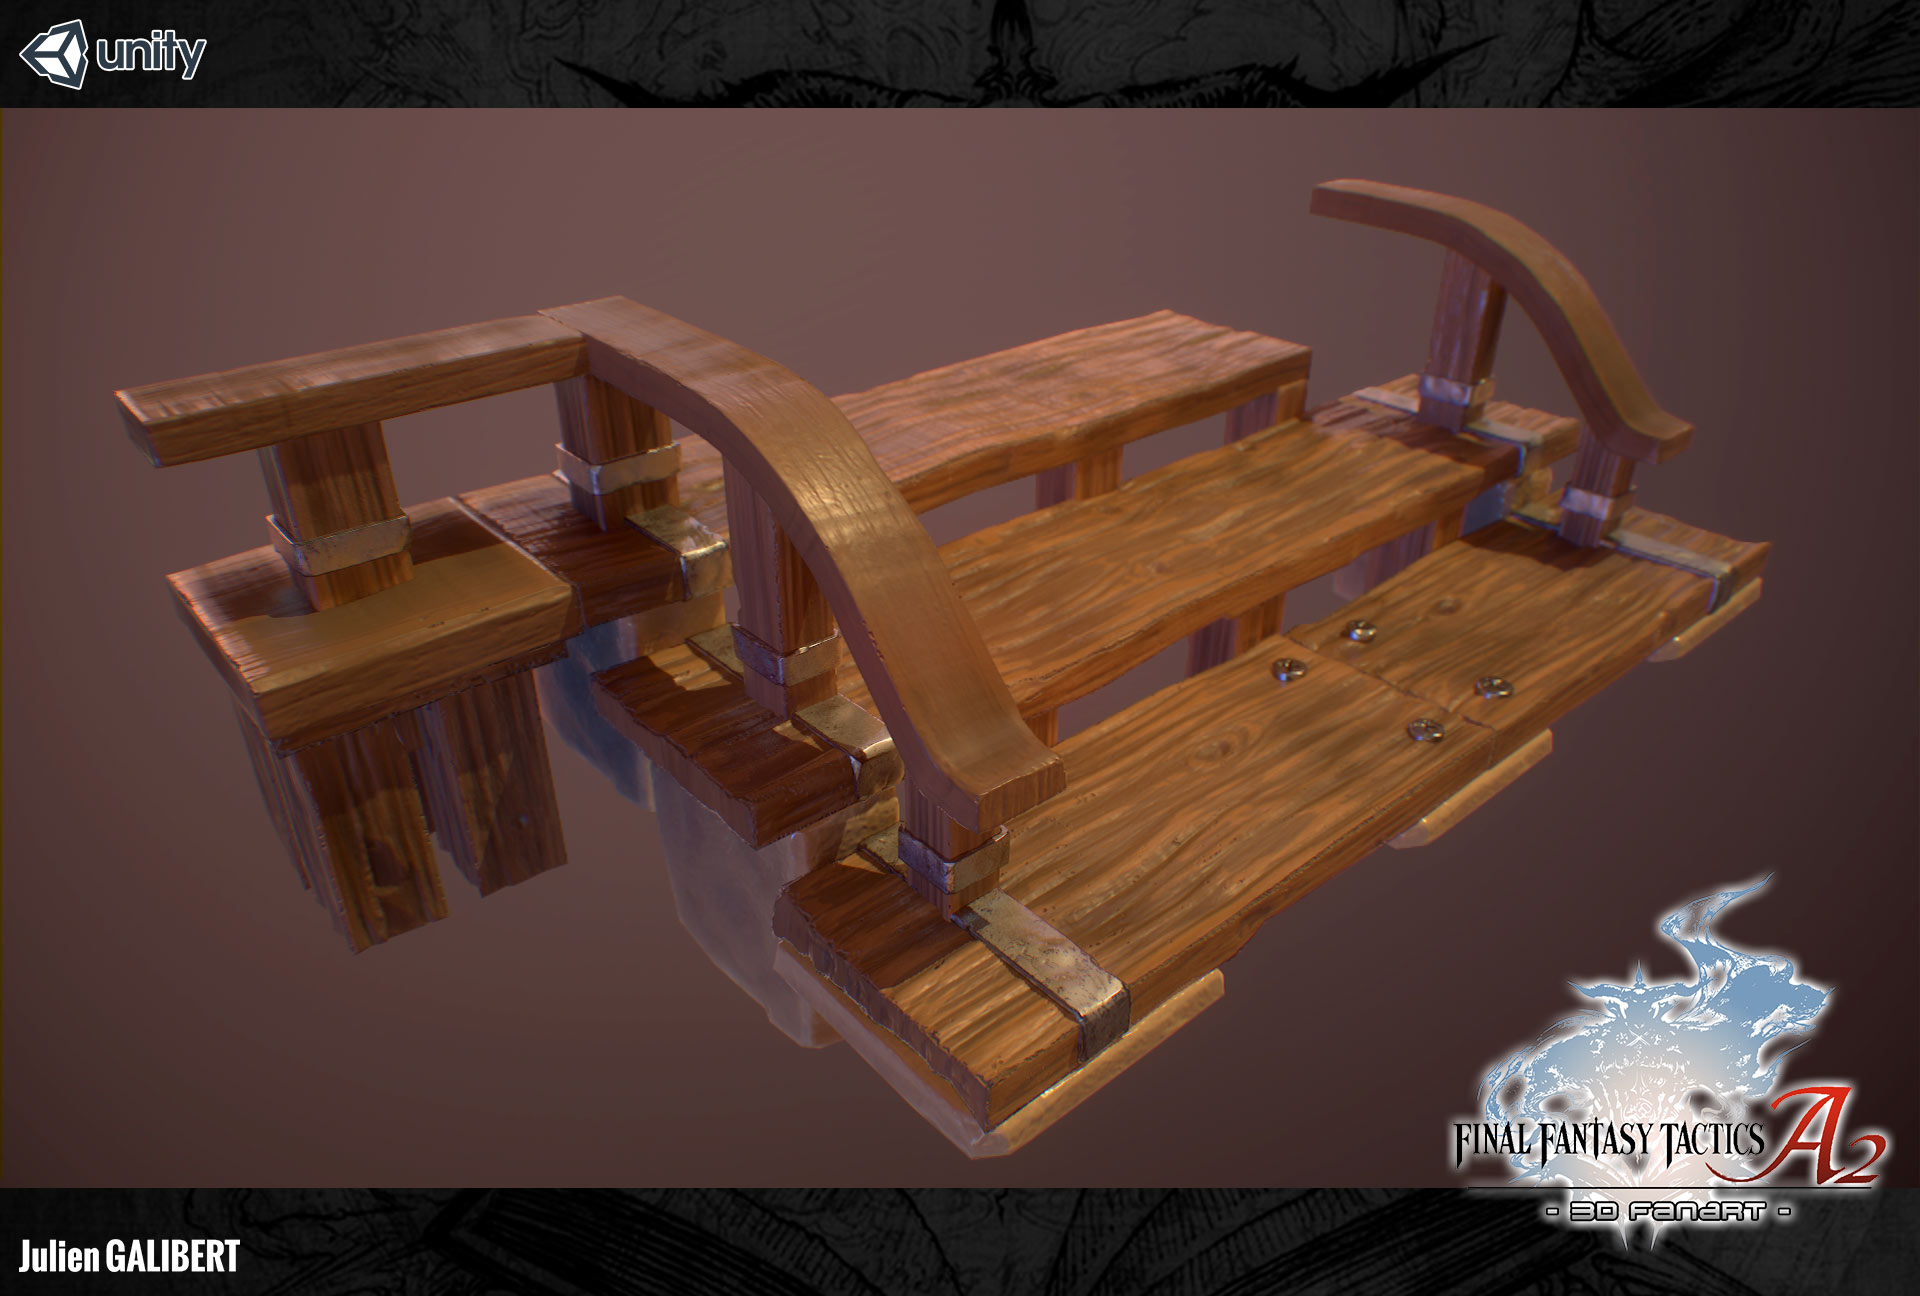 FinalFantasyTacticsAdvance2_3DFanart_Stairs_01